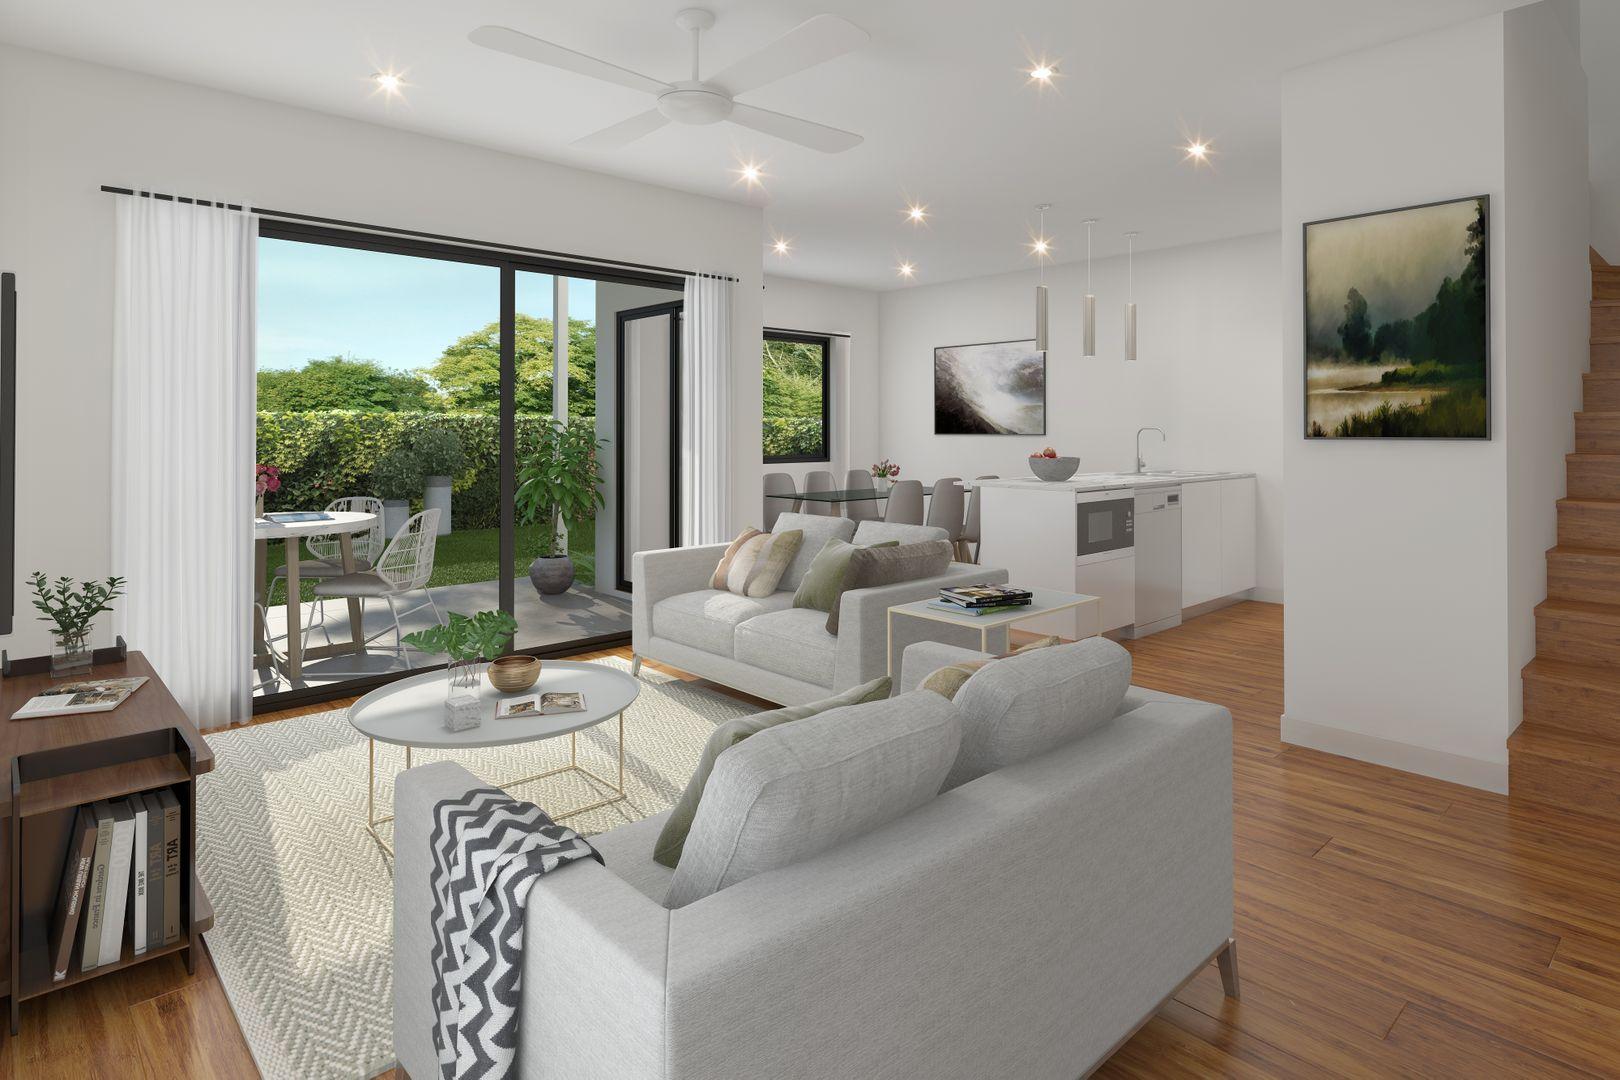 49/16 Symons Road, Sunnybank Hills QLD 4109, Image 2